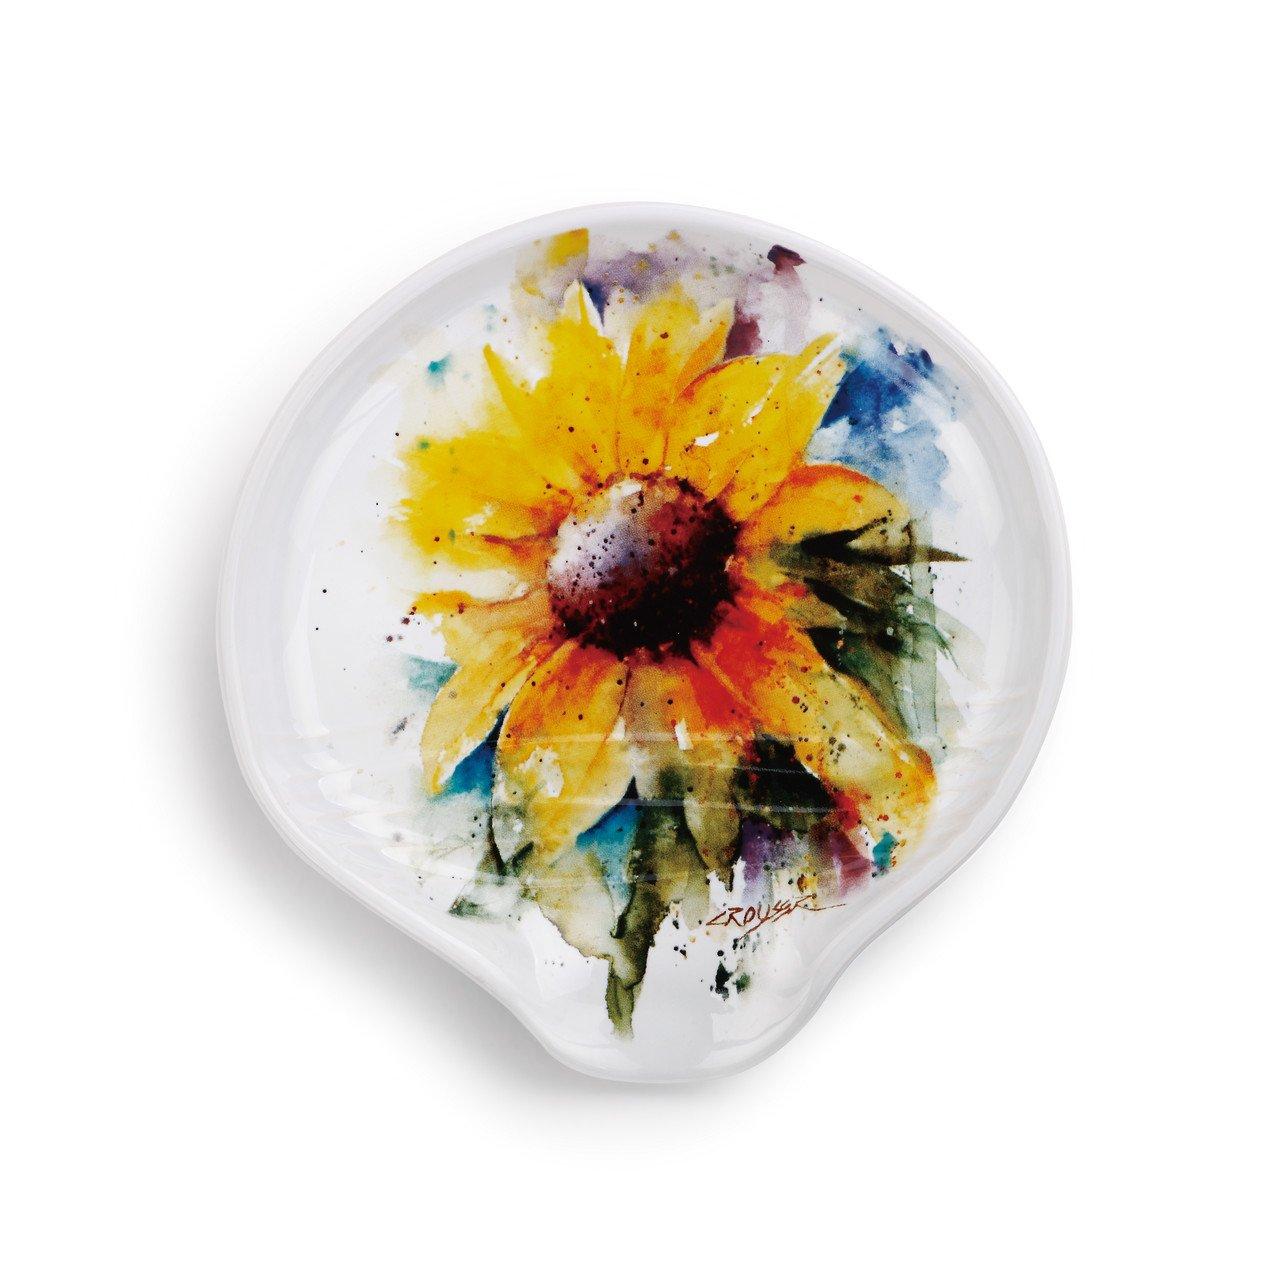 Demdaco 3005051167 Big Sky Carvers Sunflower Spoon Rest, Multicolored by Demdaco (Image #1)